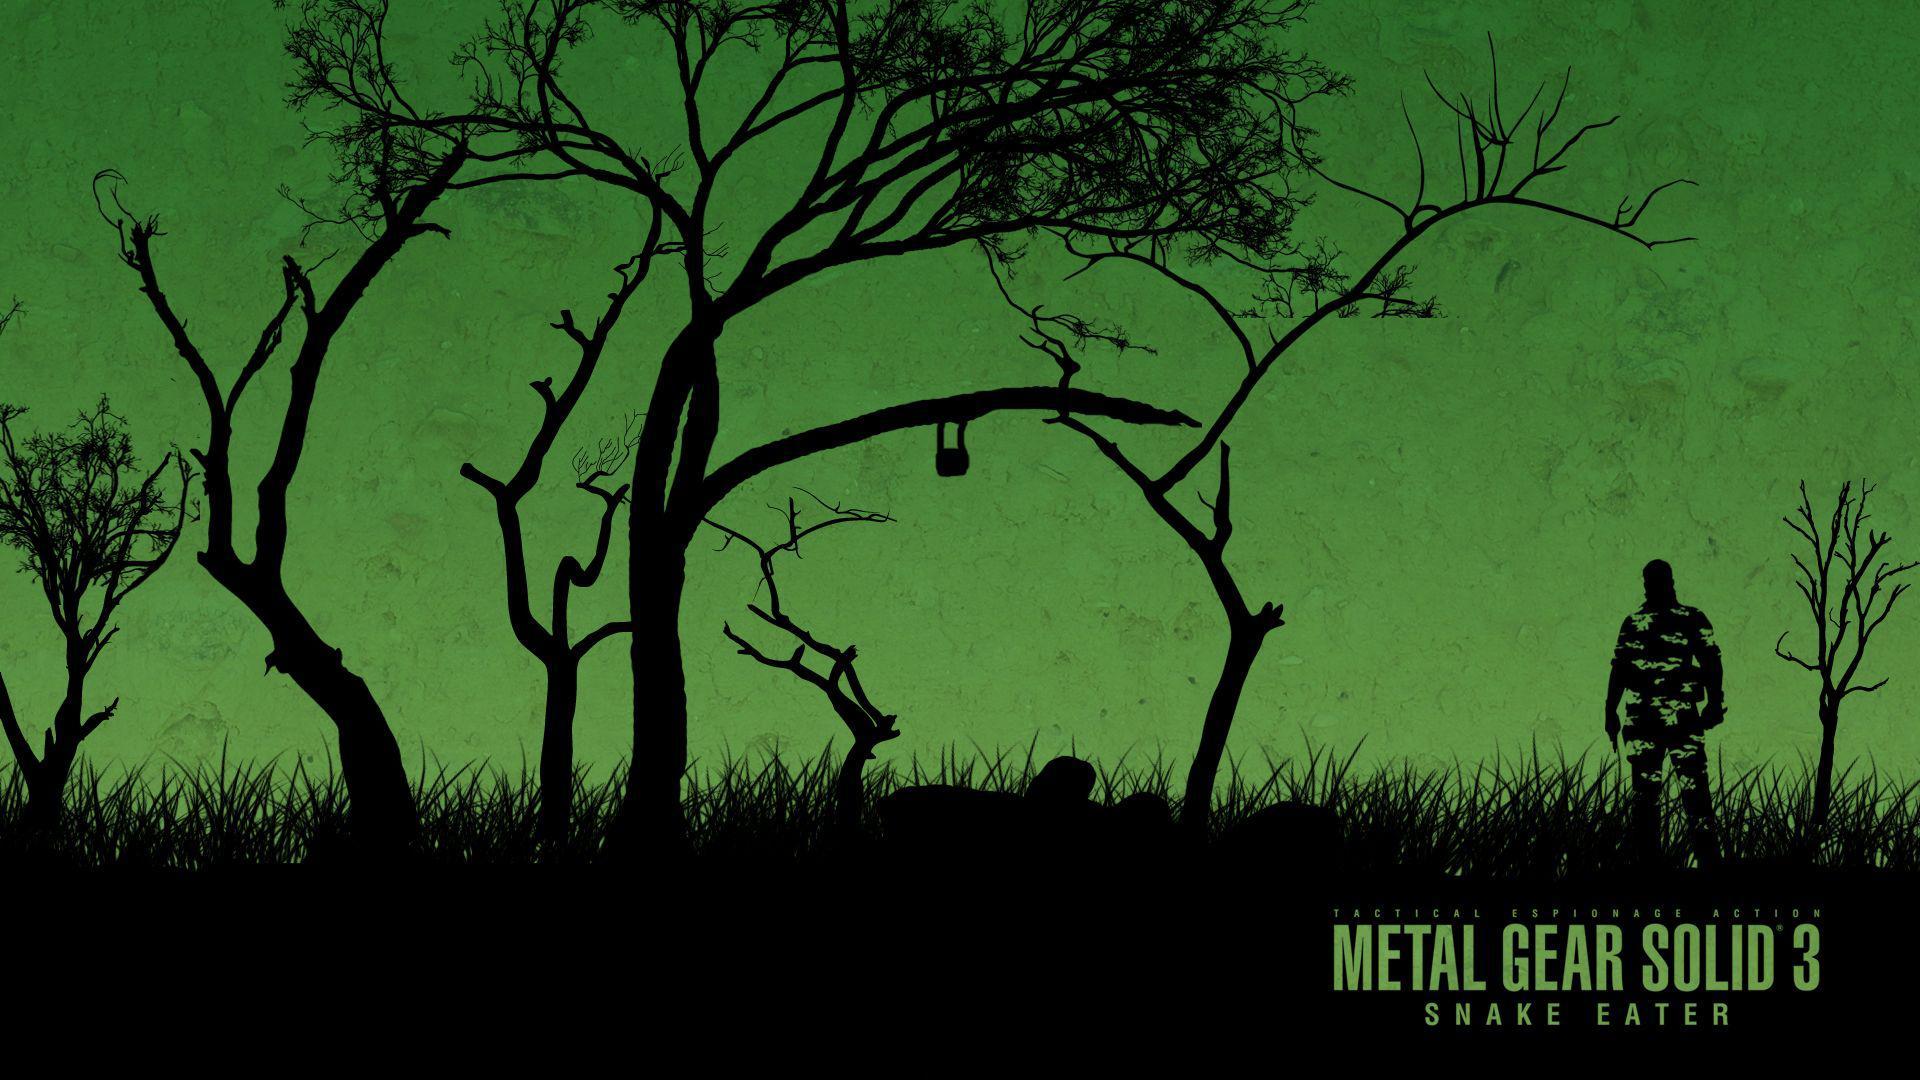 Metal Gear Solid 3 Wallpapers - Wallpaper Cave